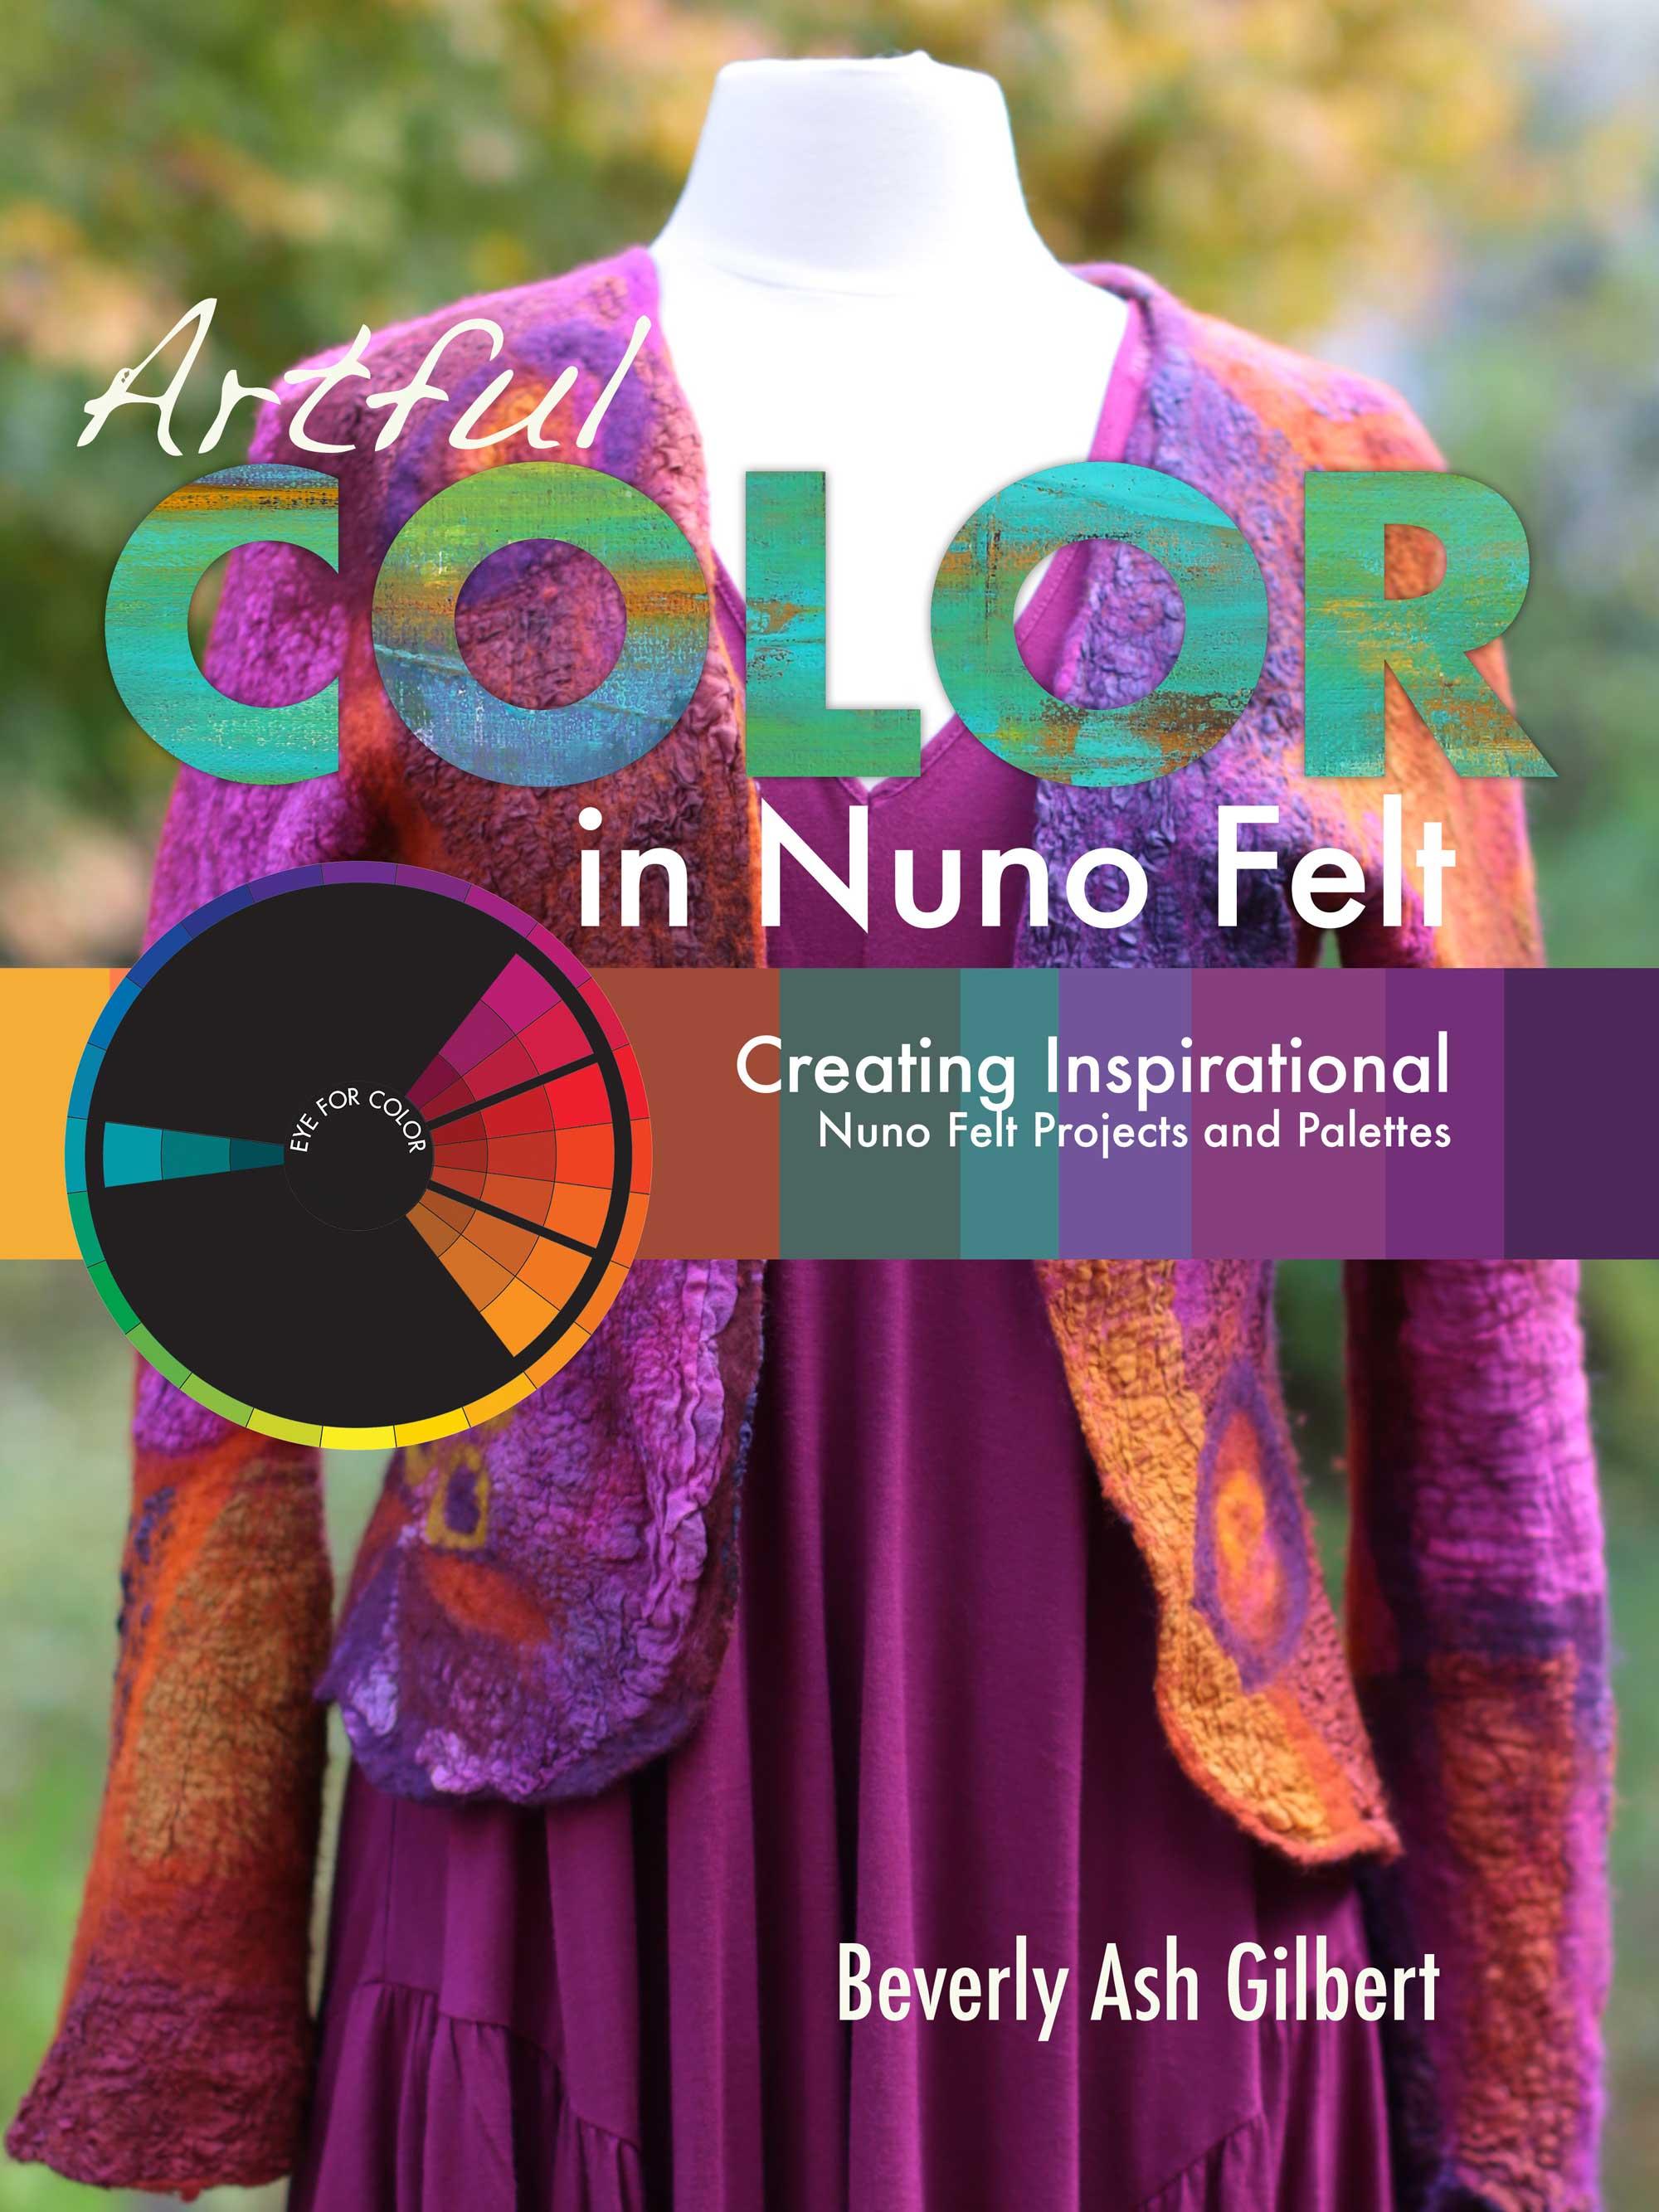 ArtfulColorinNunoFelt_Cover.jpg